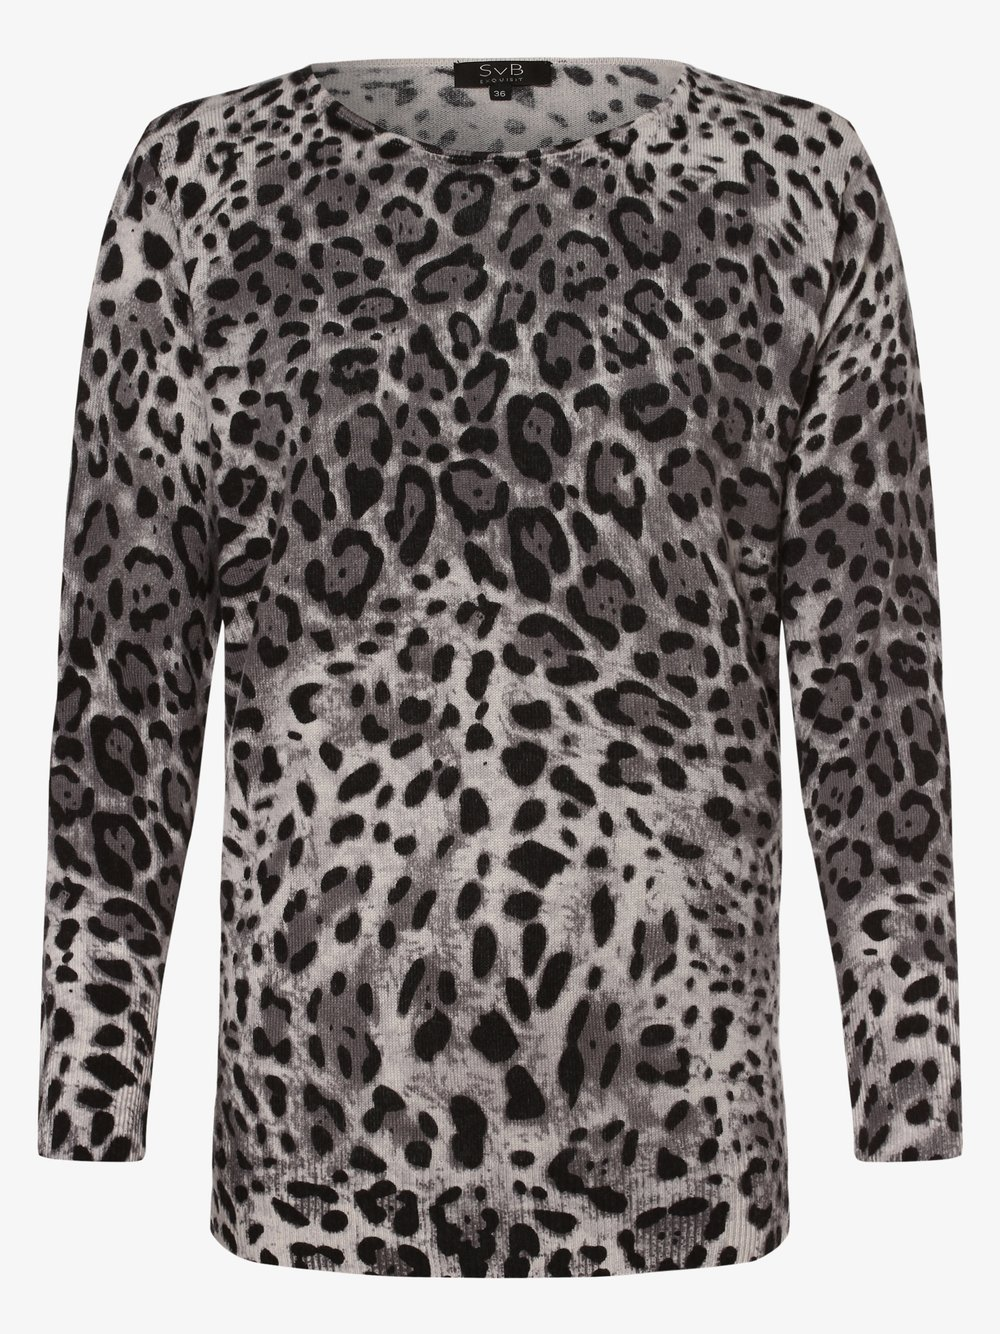 SvB Exquisit – Sweter damski z dodatkiem kaszmiru, szary Van Graaf 443468-0002-00440